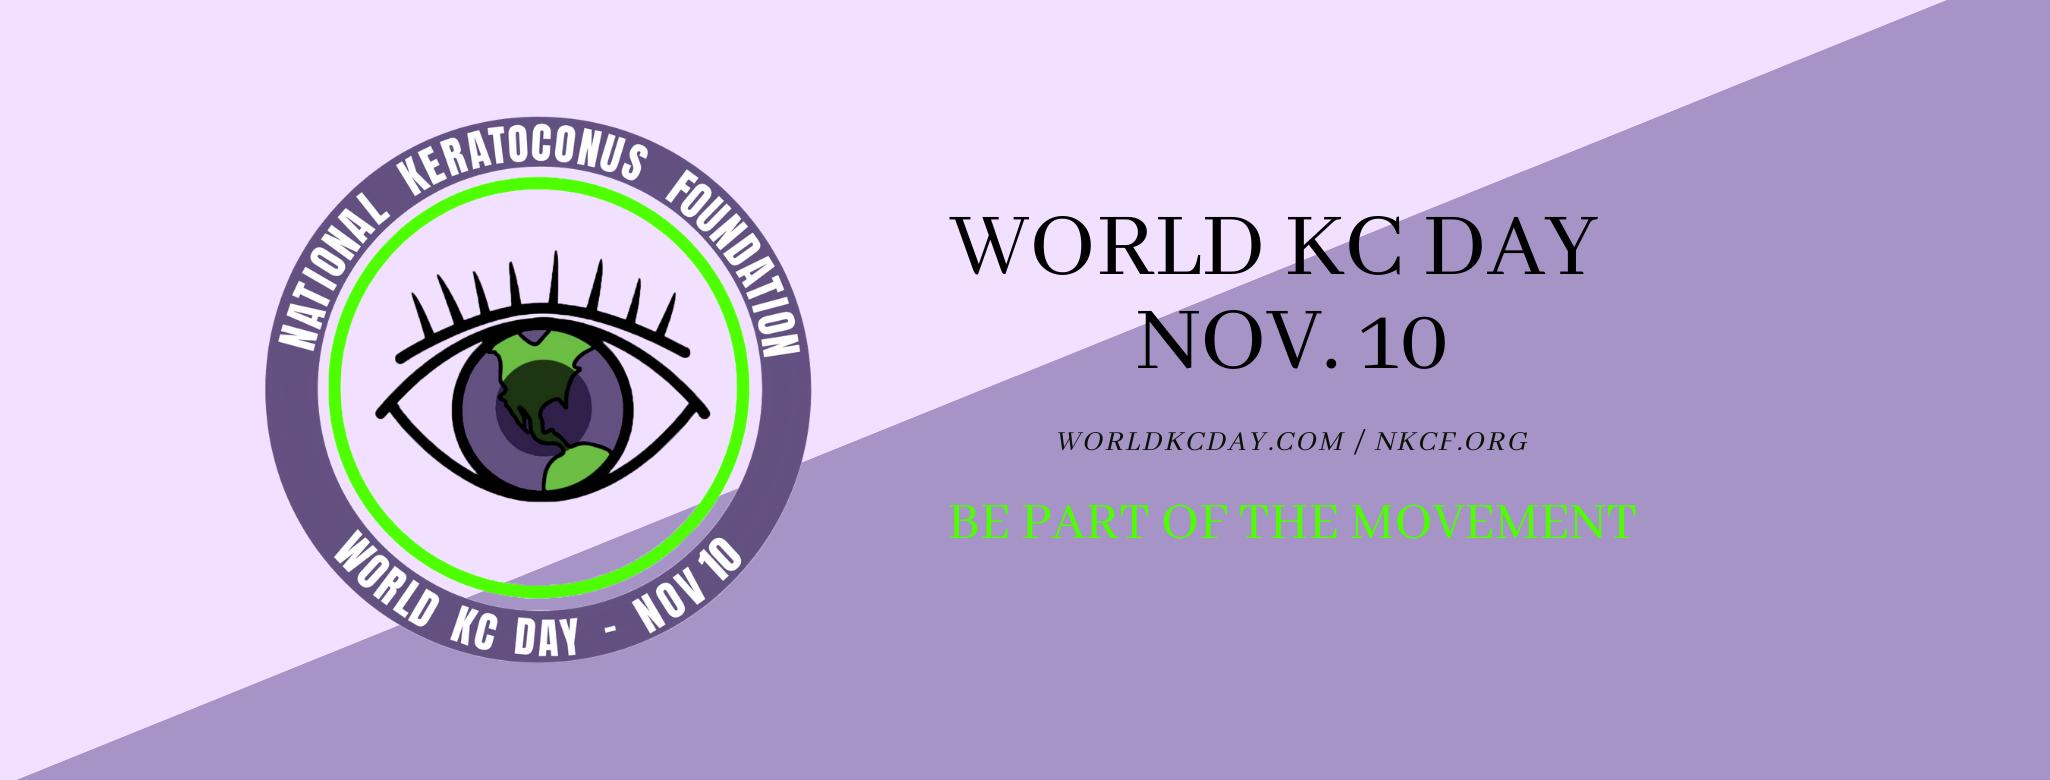 world kc day banner purple